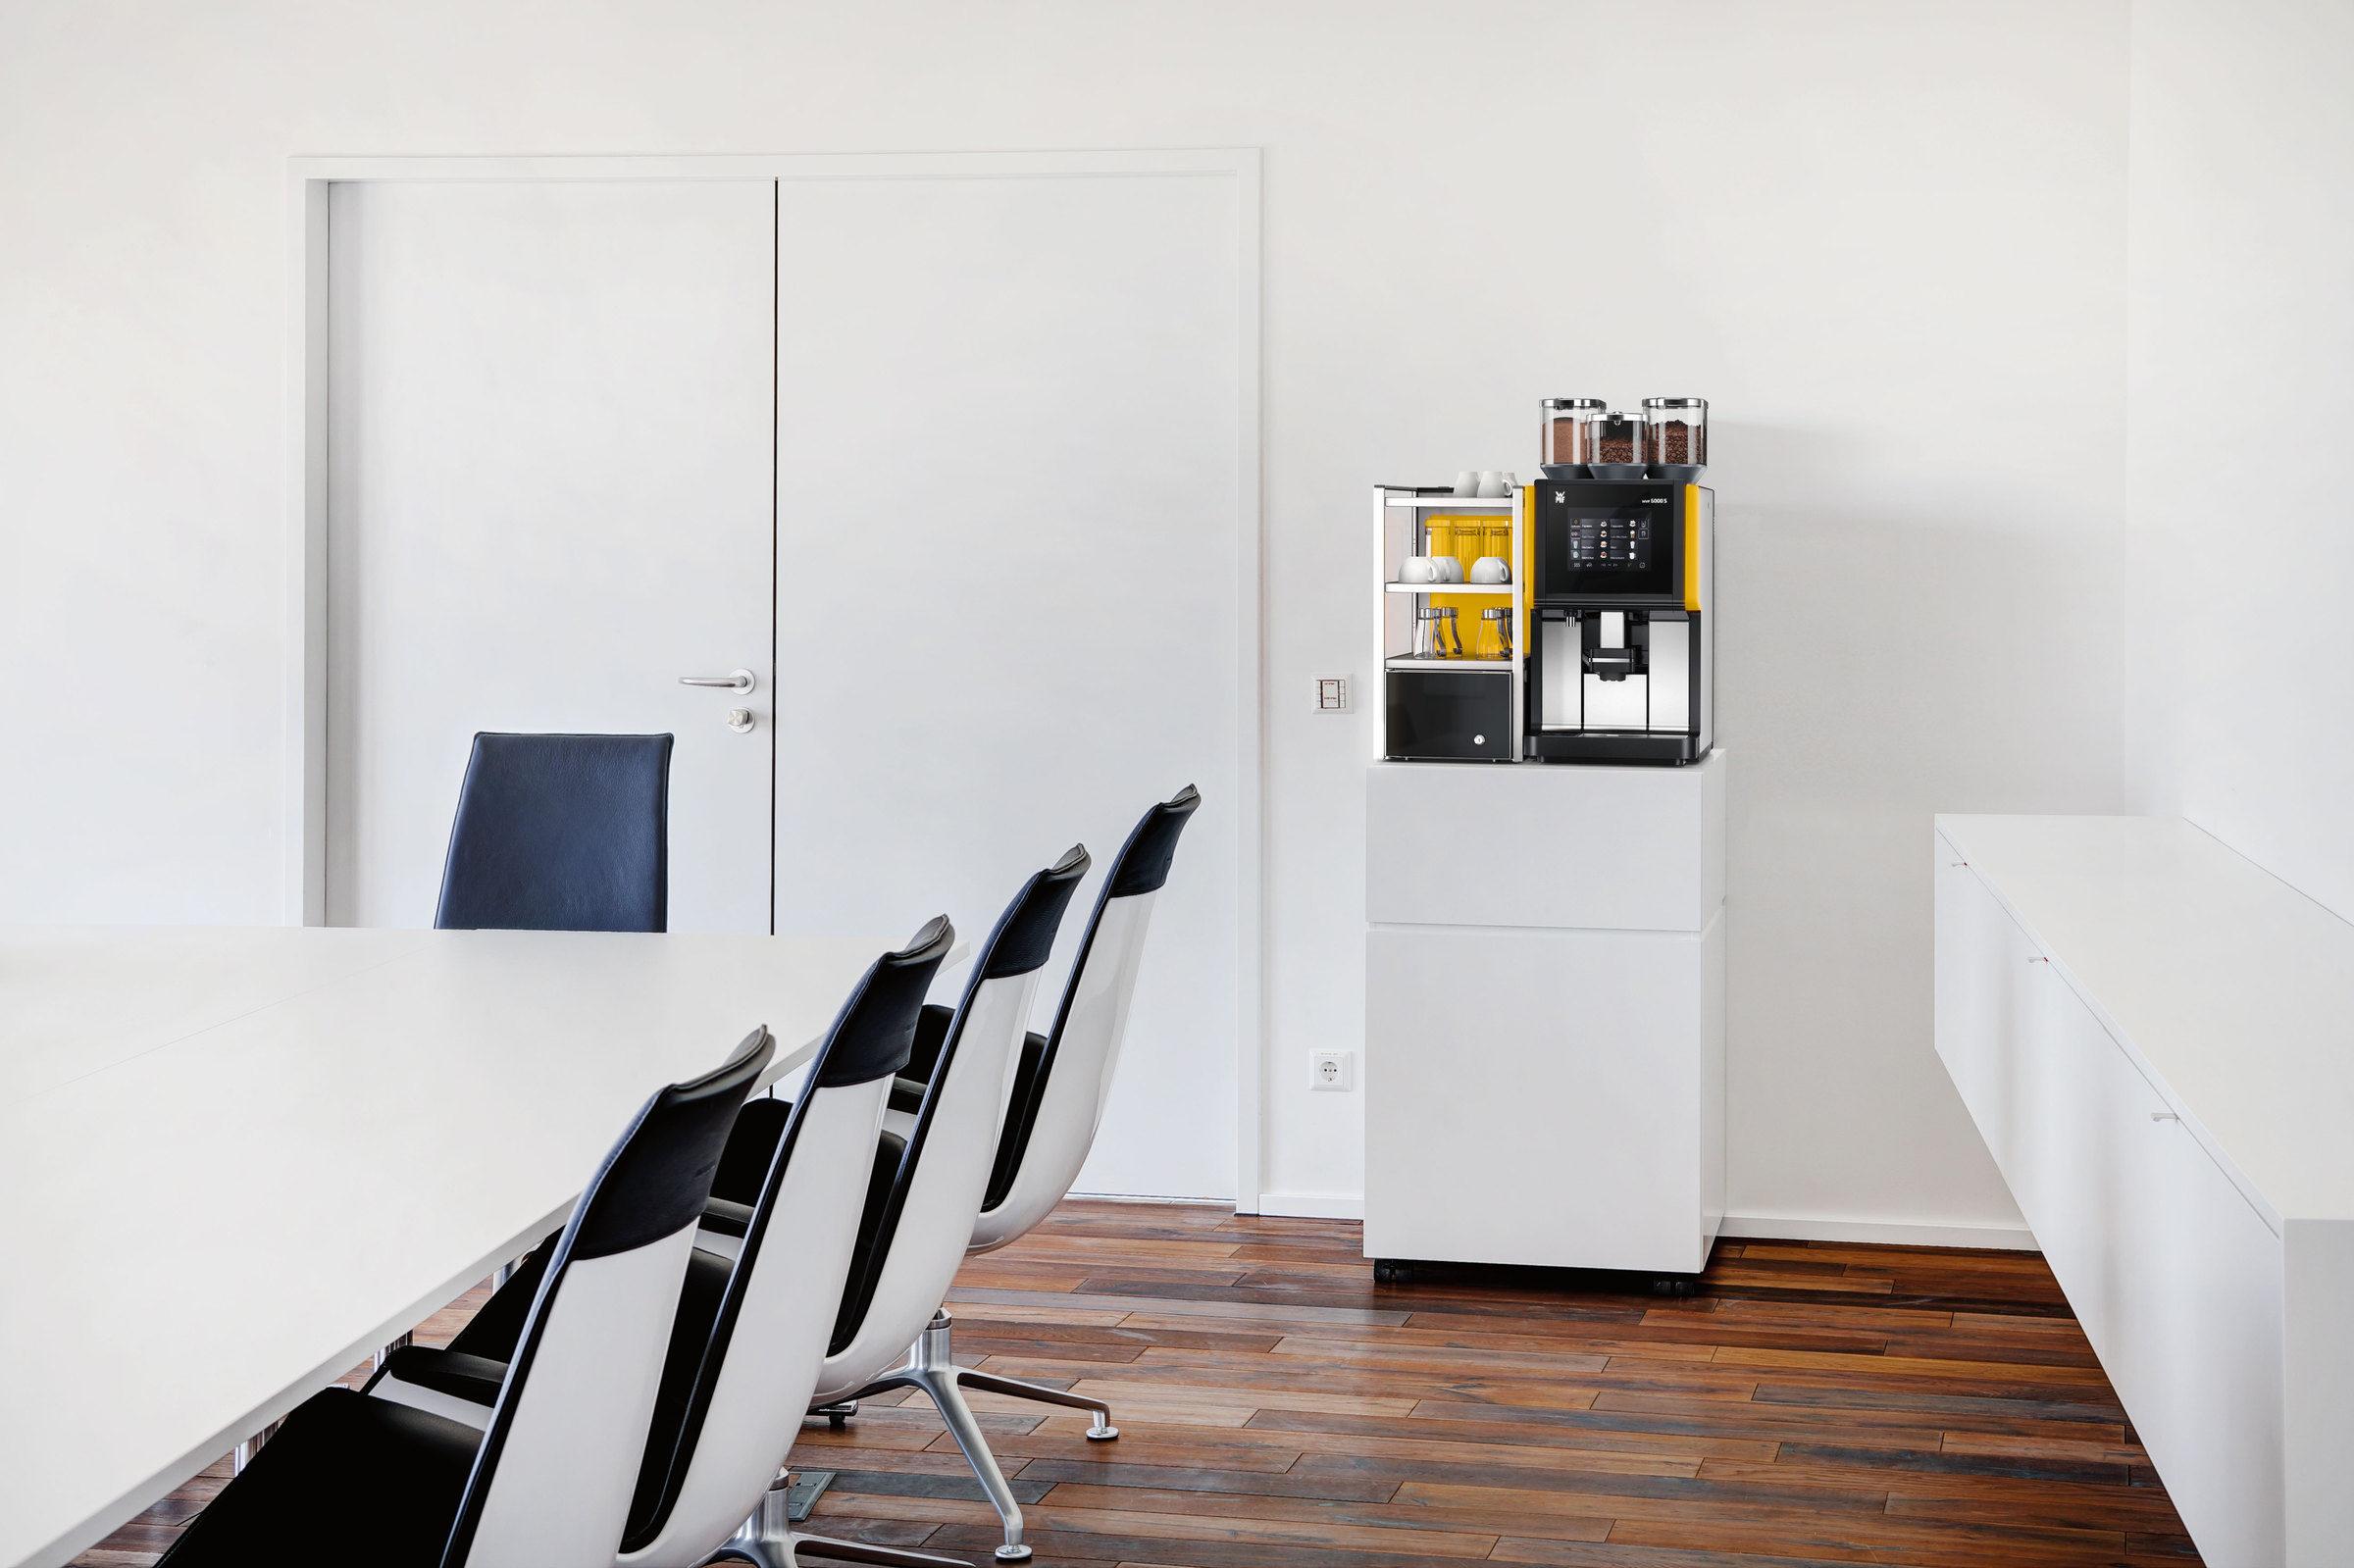 Wmf 5000S Office